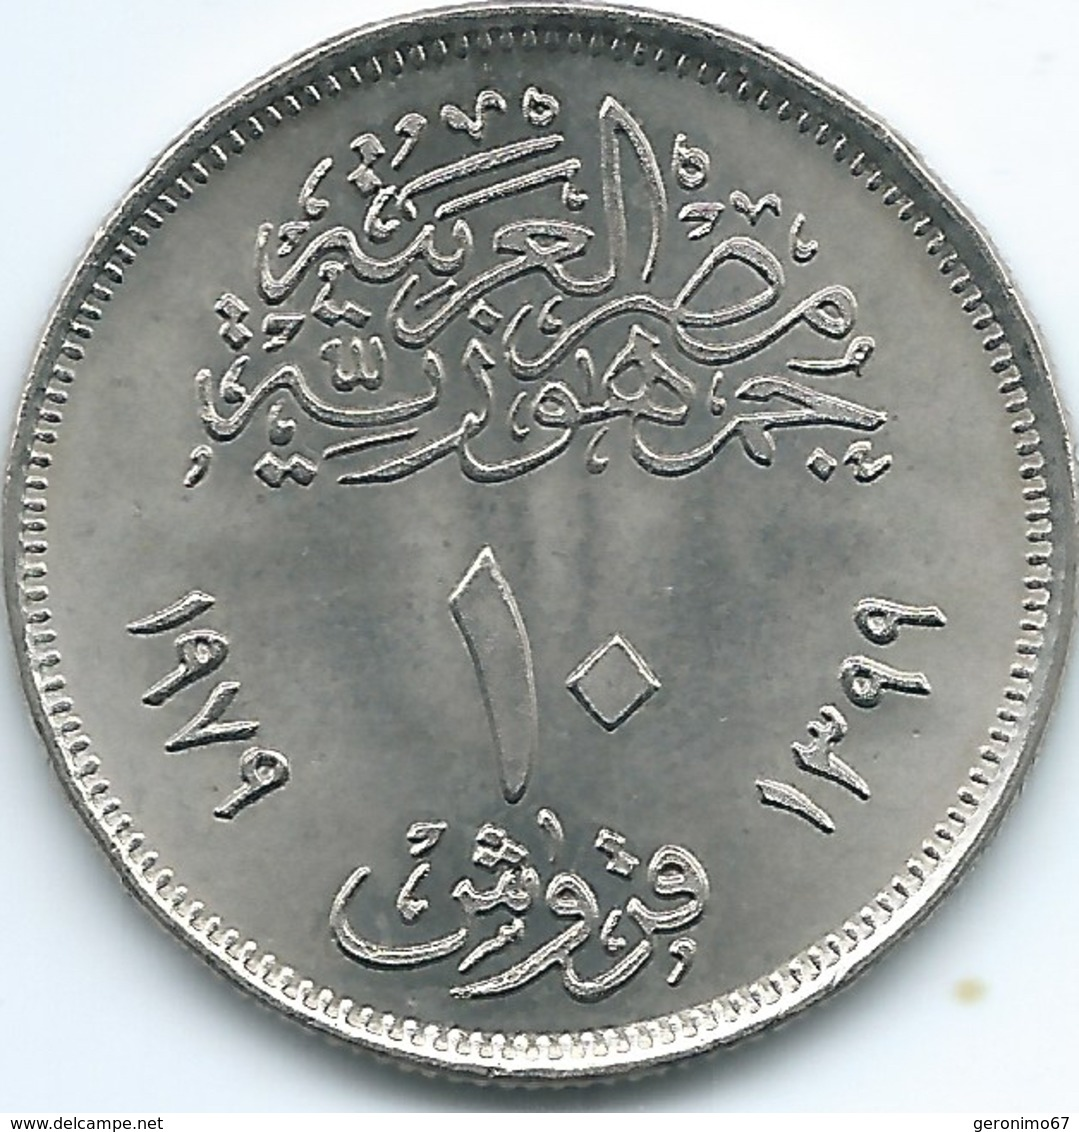 Egypt - 10 Qirsh - AH1399 (1979) - National Education Day - KM486 - Egypt